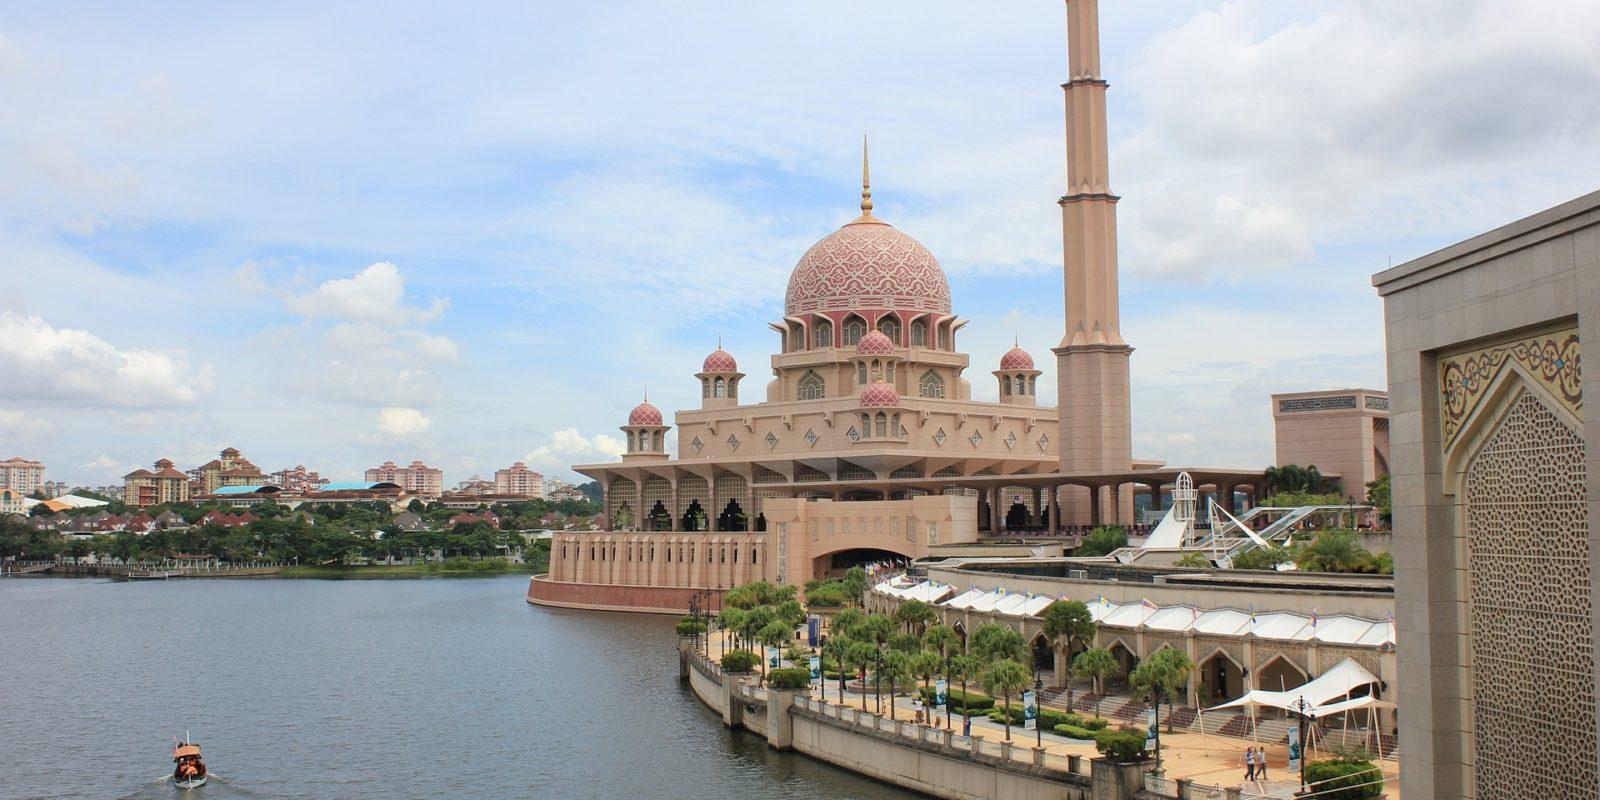 Parliament Putrajaya, Kuala Lumpur, Malayasia.